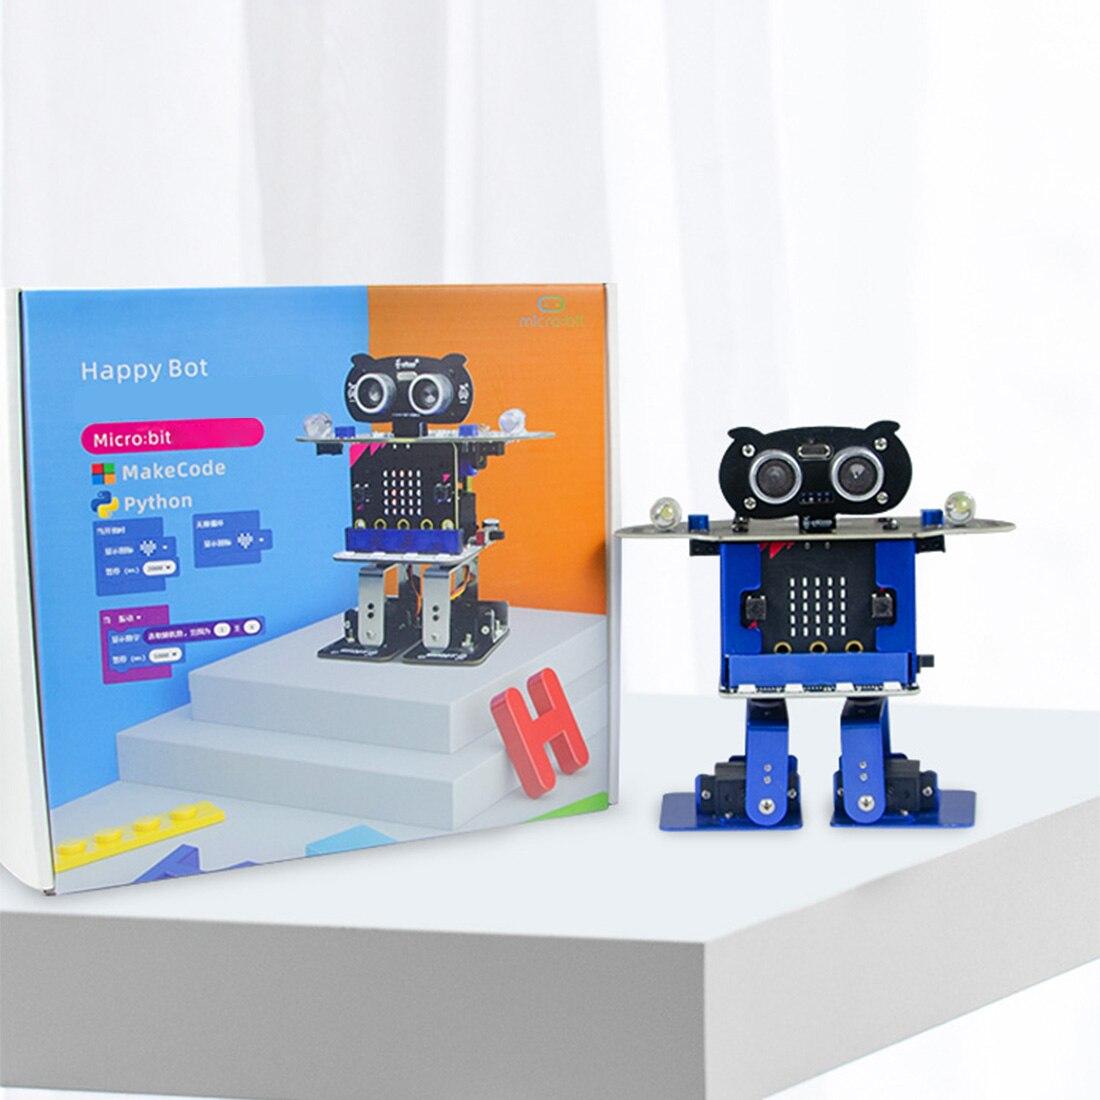 Programmable Dancing Robot Bipedal Humanoid Microbit Robot DIY Programming Starter Kit For Microbit Children Kids Birthday Gift